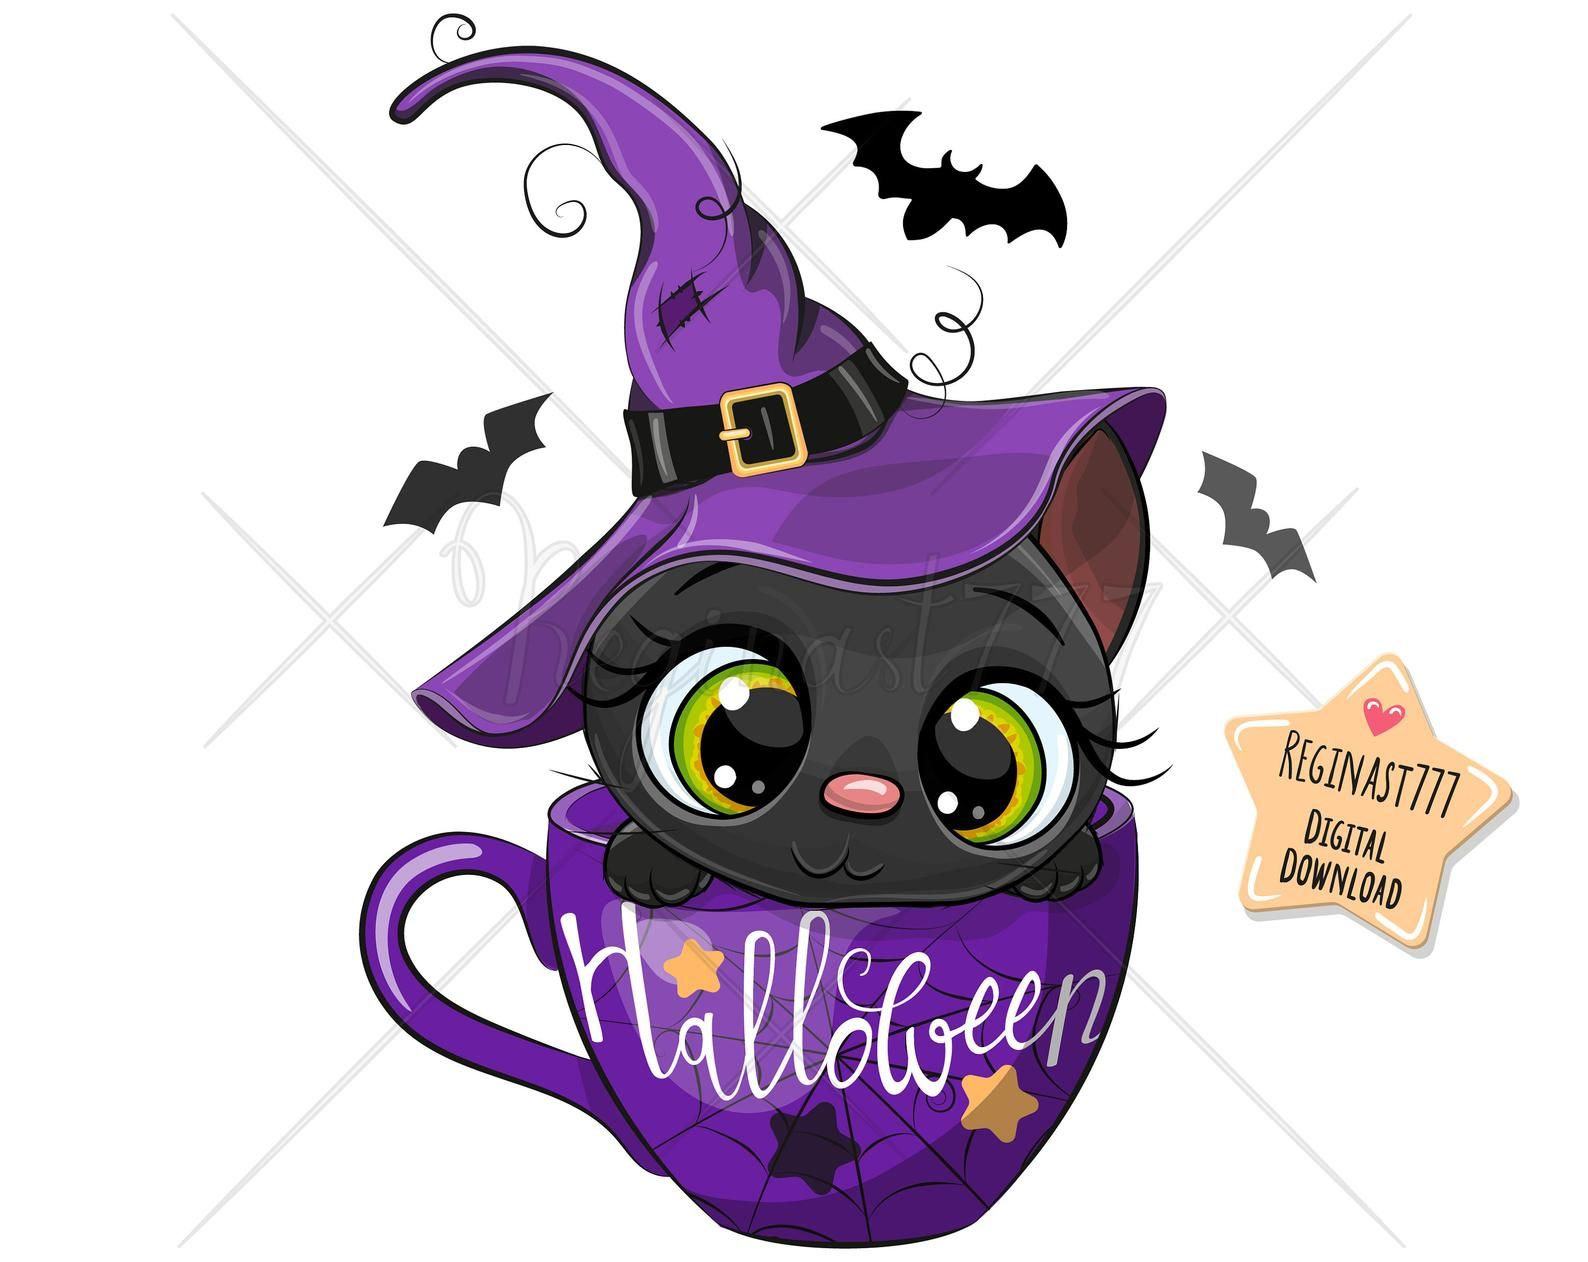 Cute Halloween Black Cat Png Digital Download Clipart Kids Etsy Kids Graphics Halloween Prints Black Cat Halloween